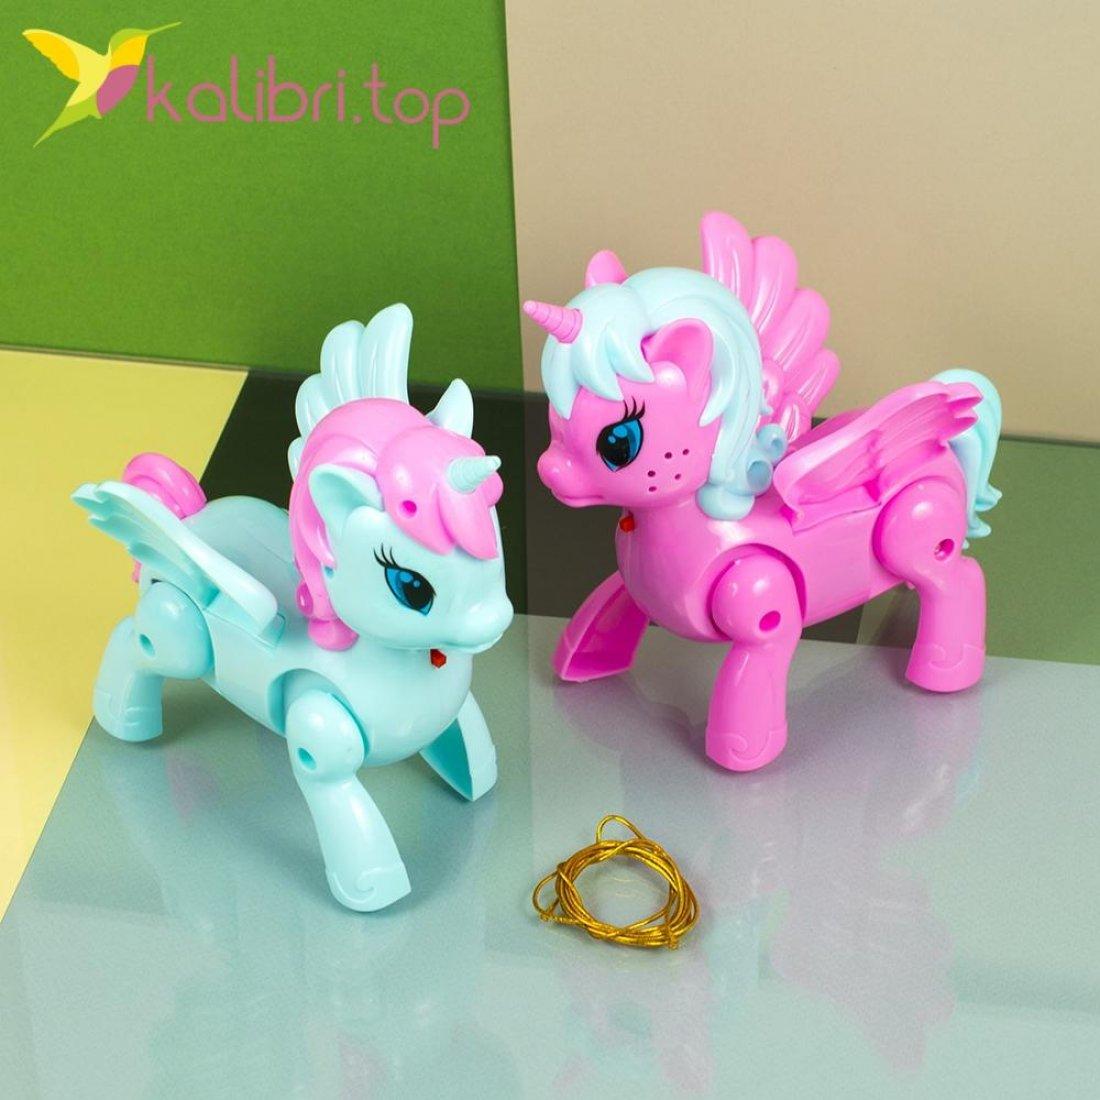 Интерактивные игрушки ходилки Единороги оптом фото 1